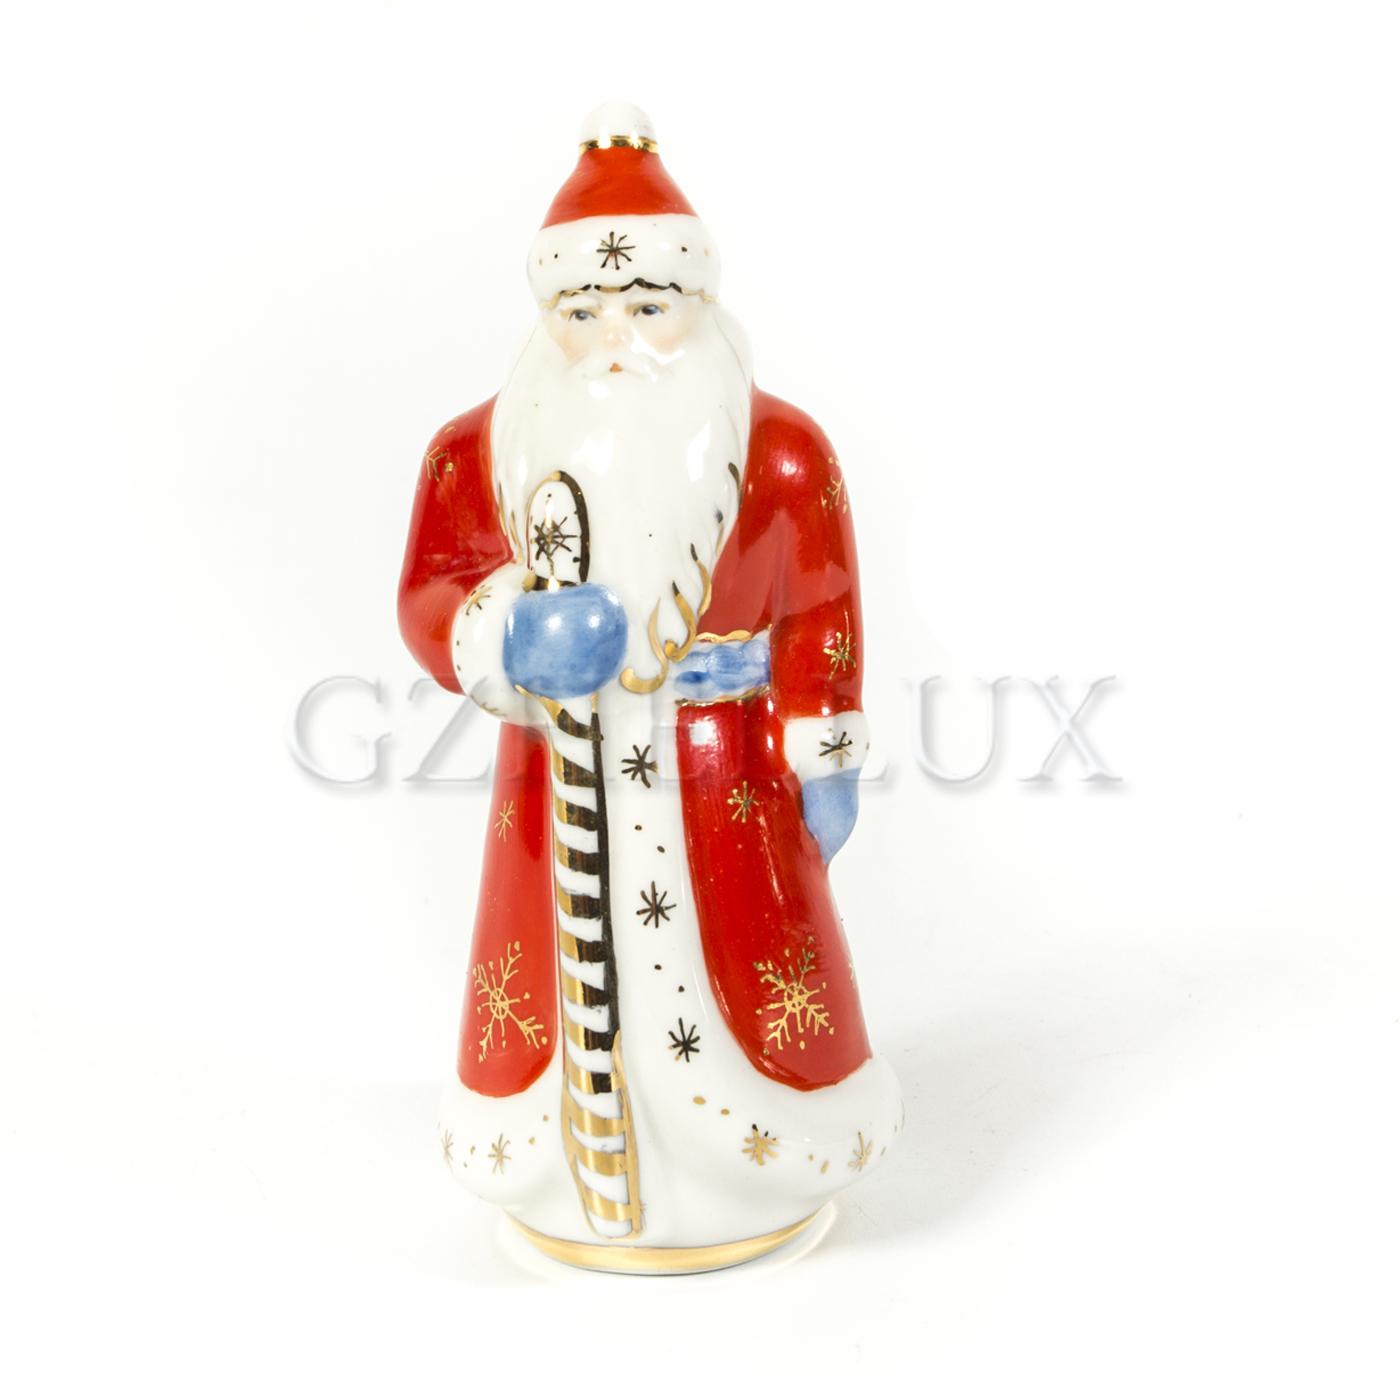 Скульптура «Дед Мороз» в красках